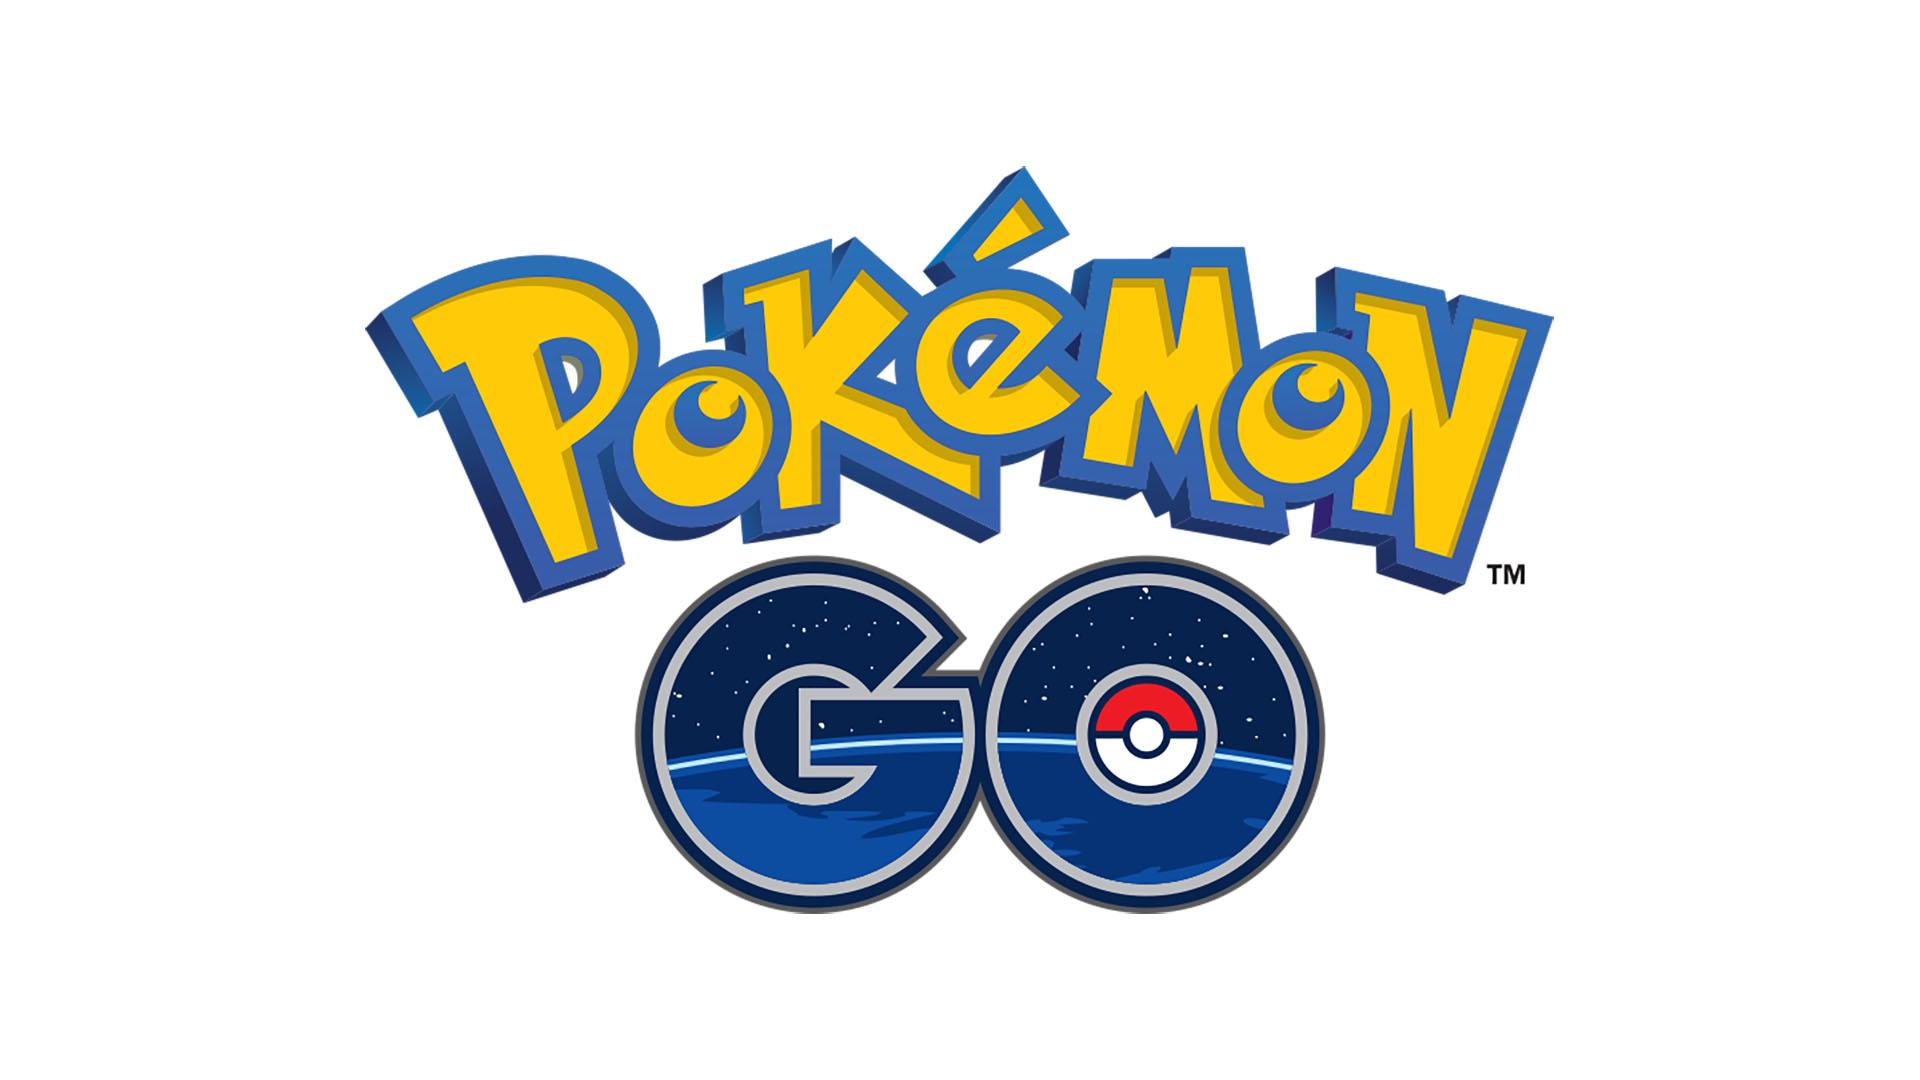 Pokémon GO-Updates bringen neue kooperative Gameplay-Features